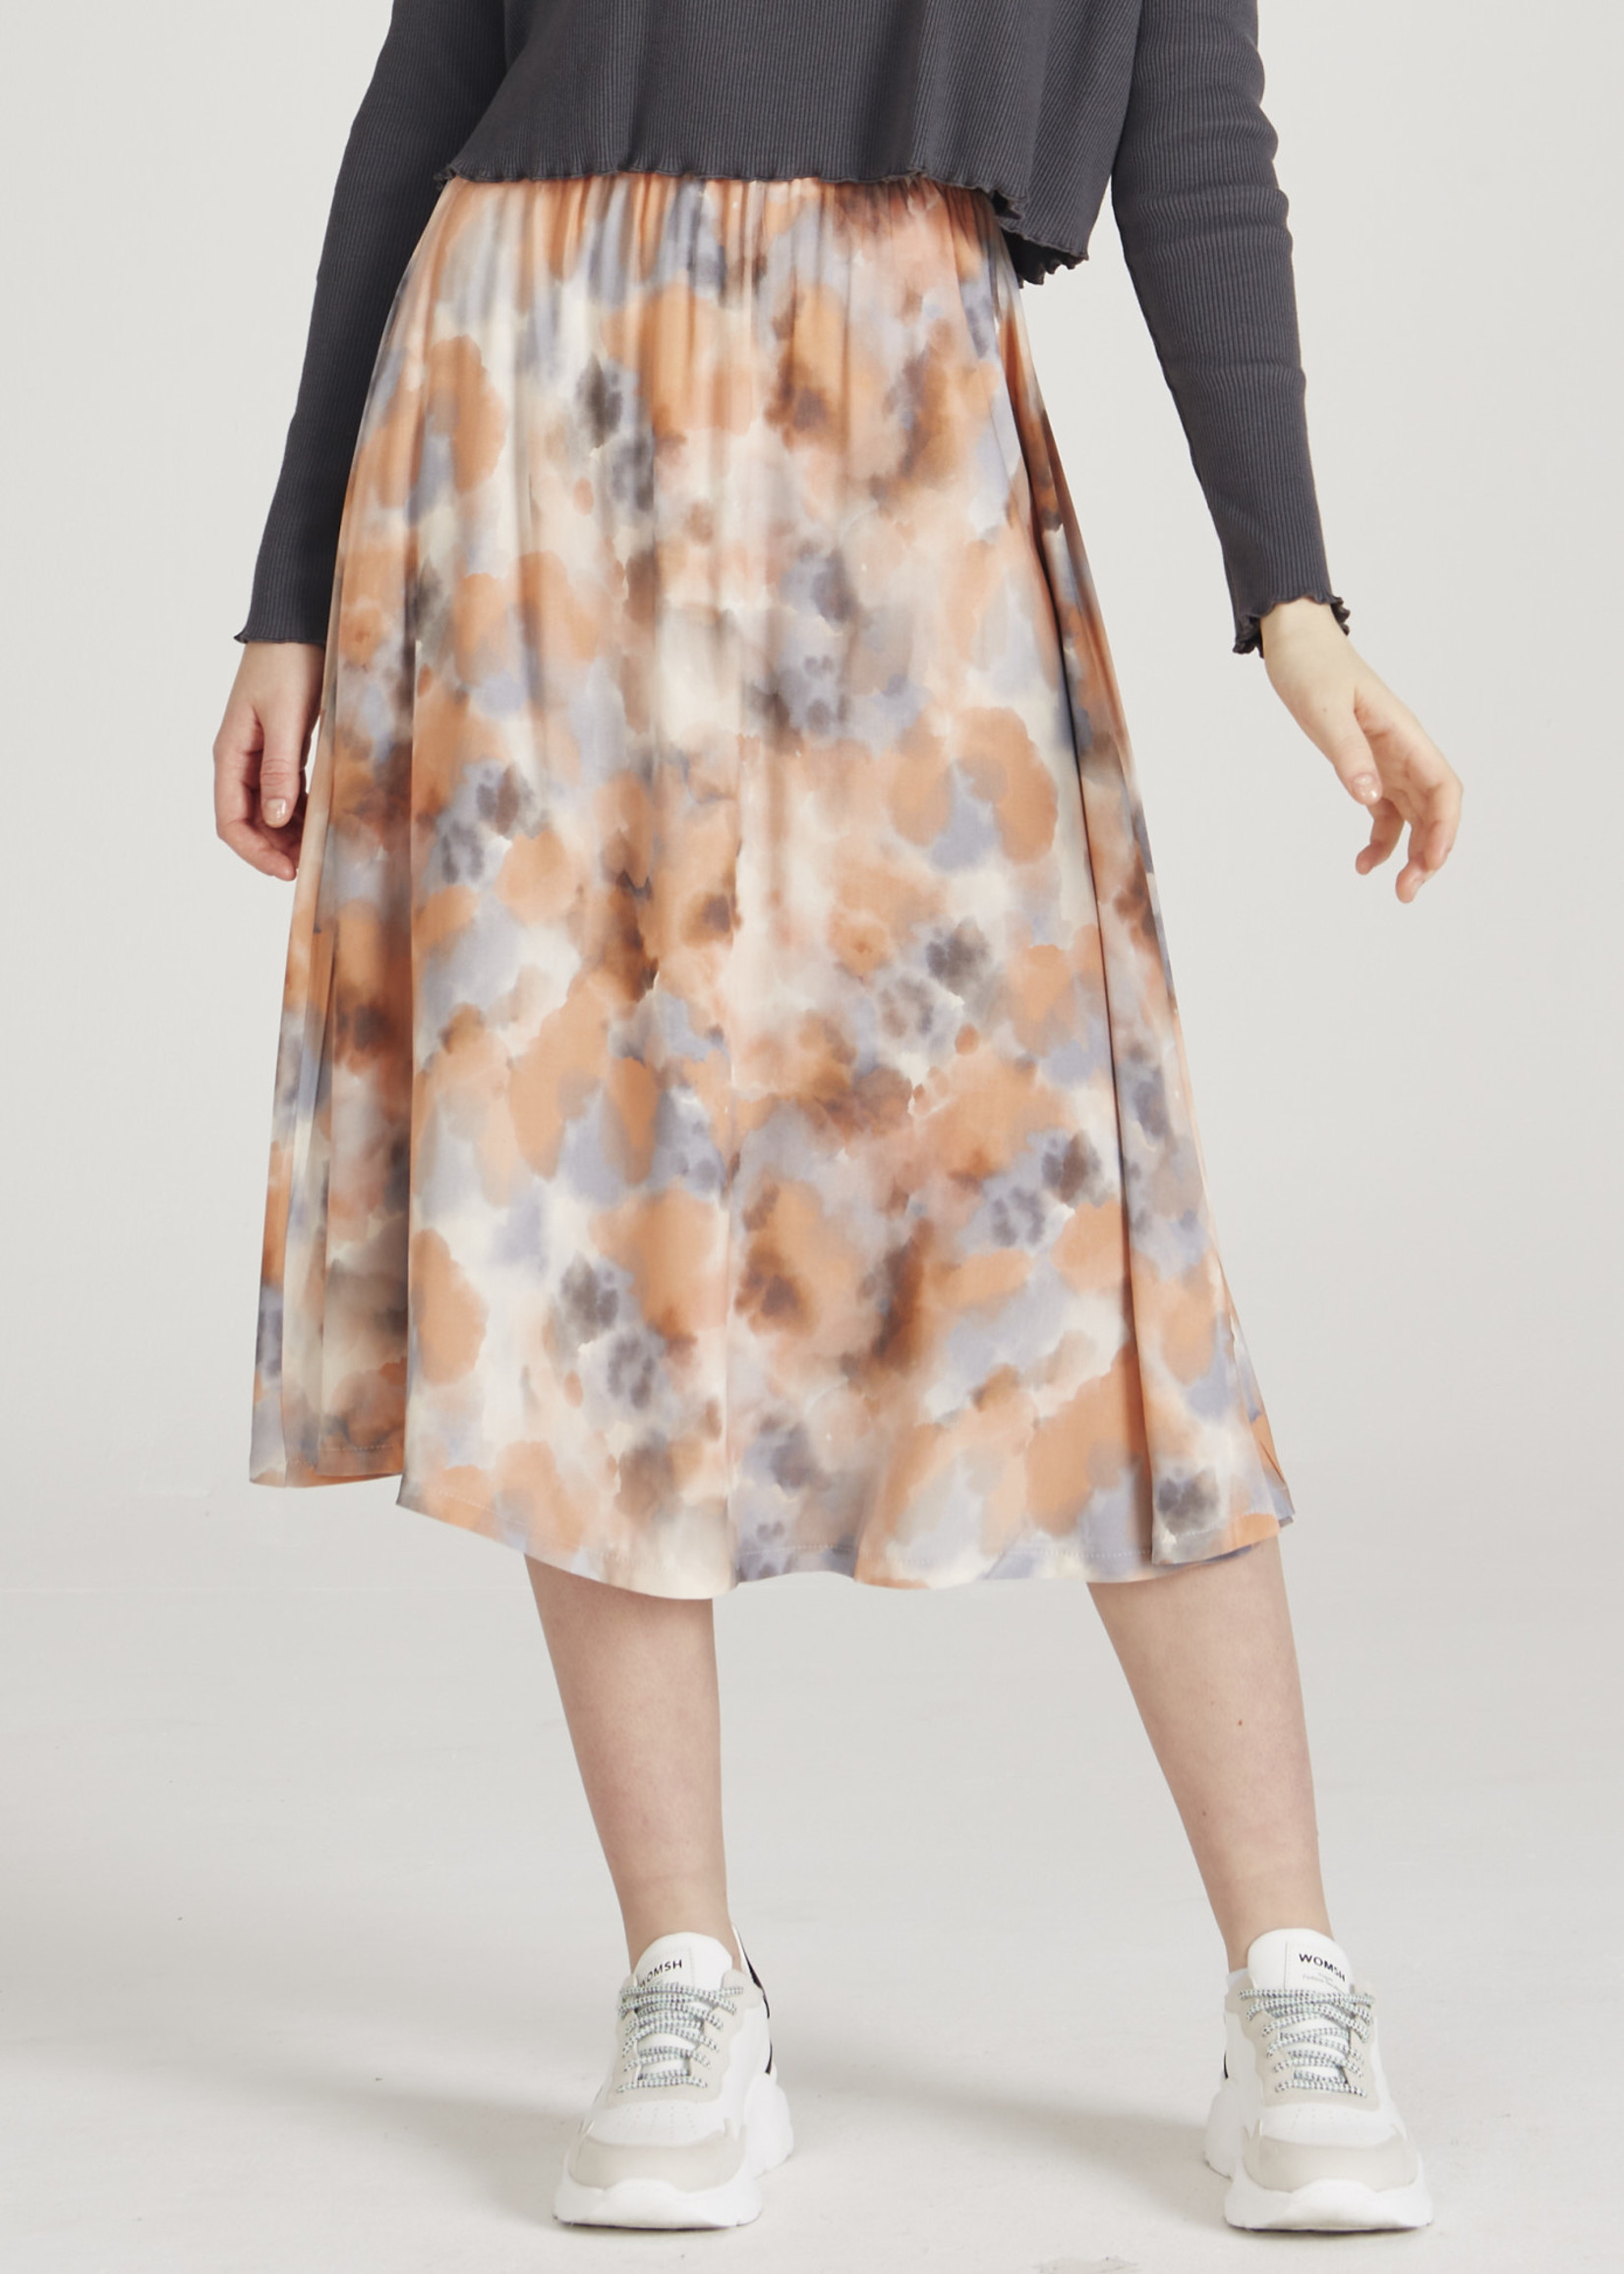 Givn Vana Skirt (printed)